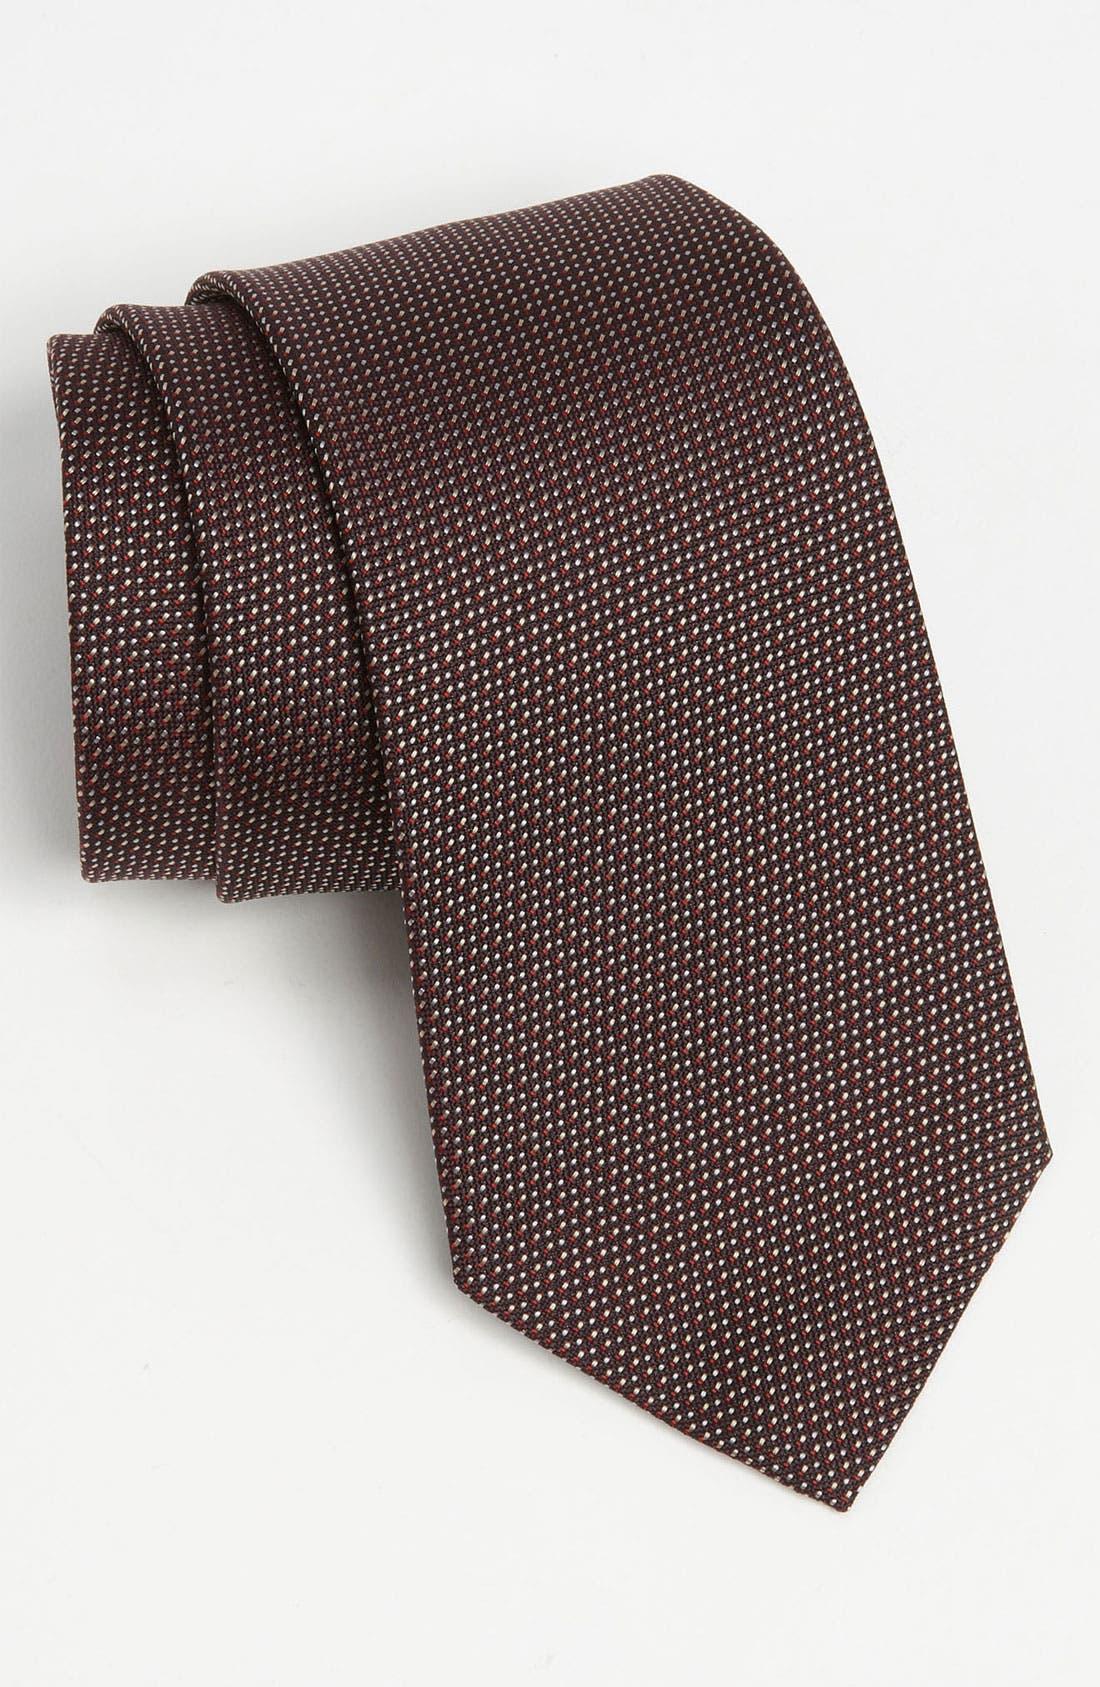 Alternate Image 1 Selected - Z Zegna Woven Silk Tie